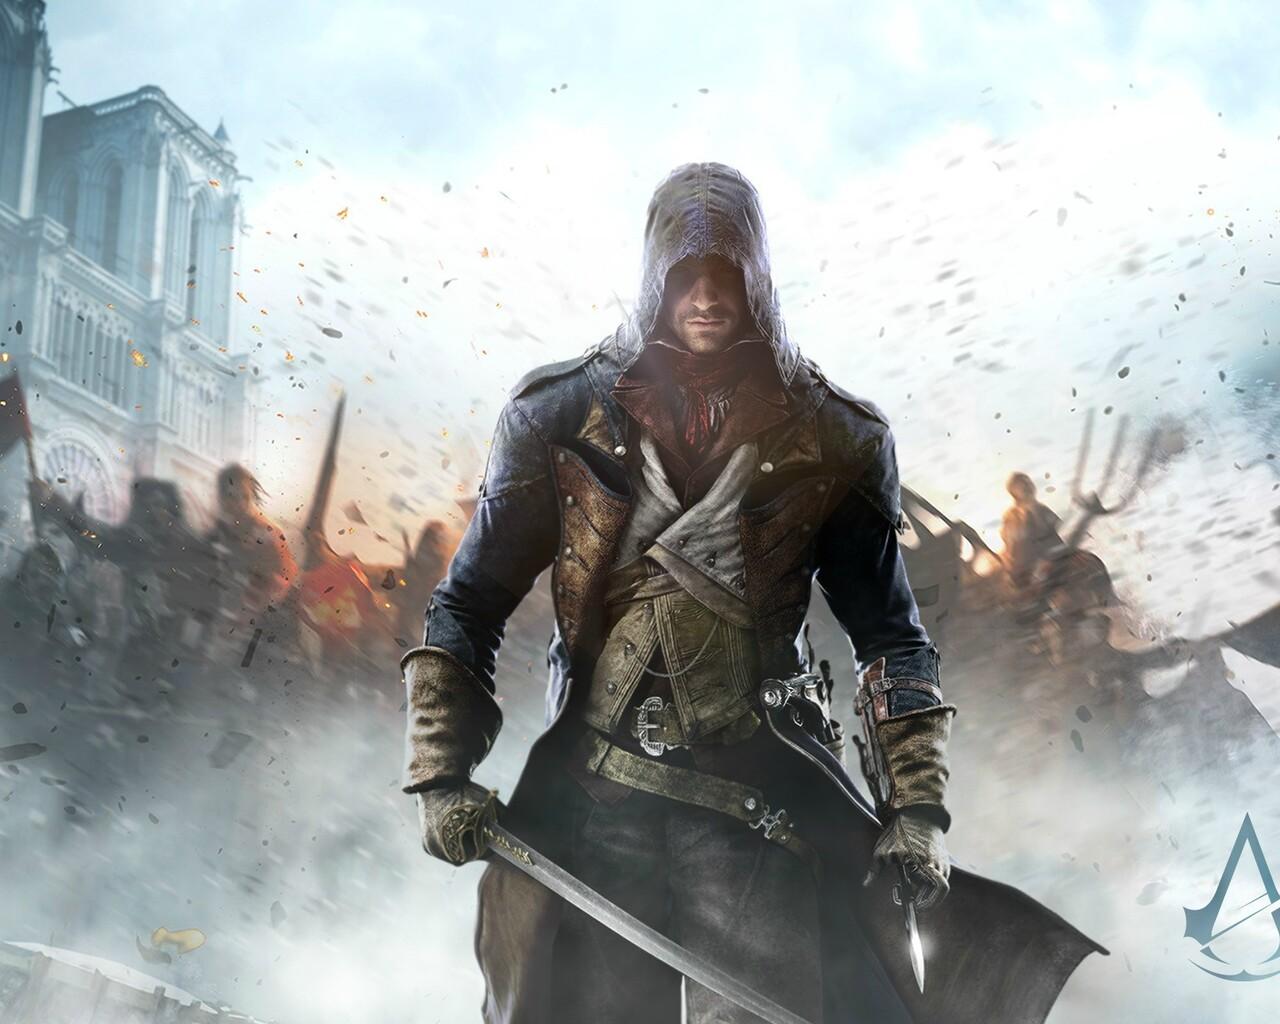 1280x1024 Assassins Creed Unity Game Hd 1280x1024 Resolution Hd 4k